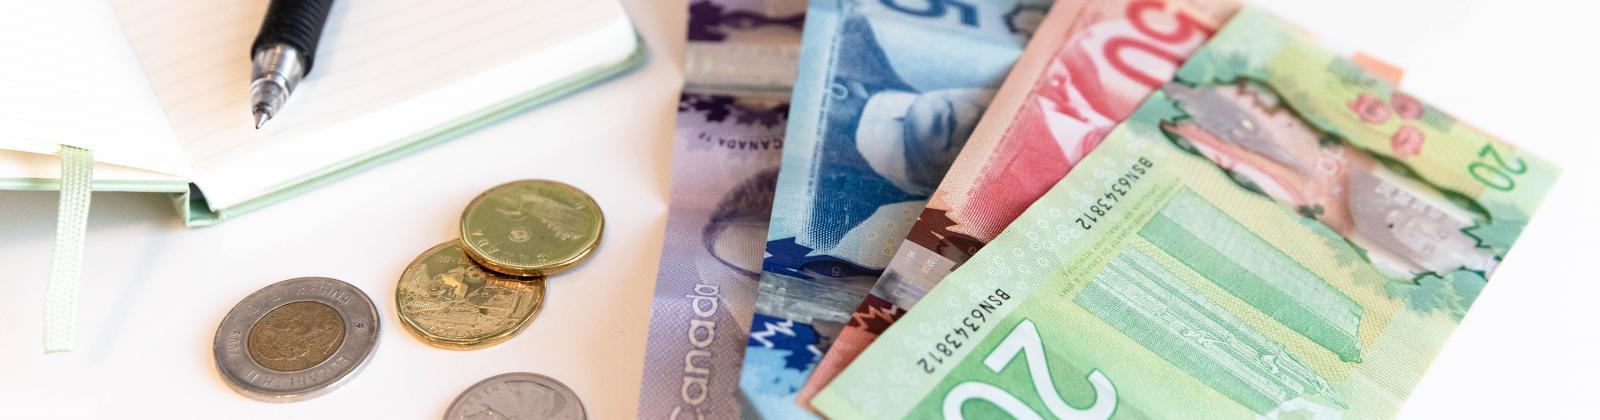 Bills and change on a desk alongside an expense notebook